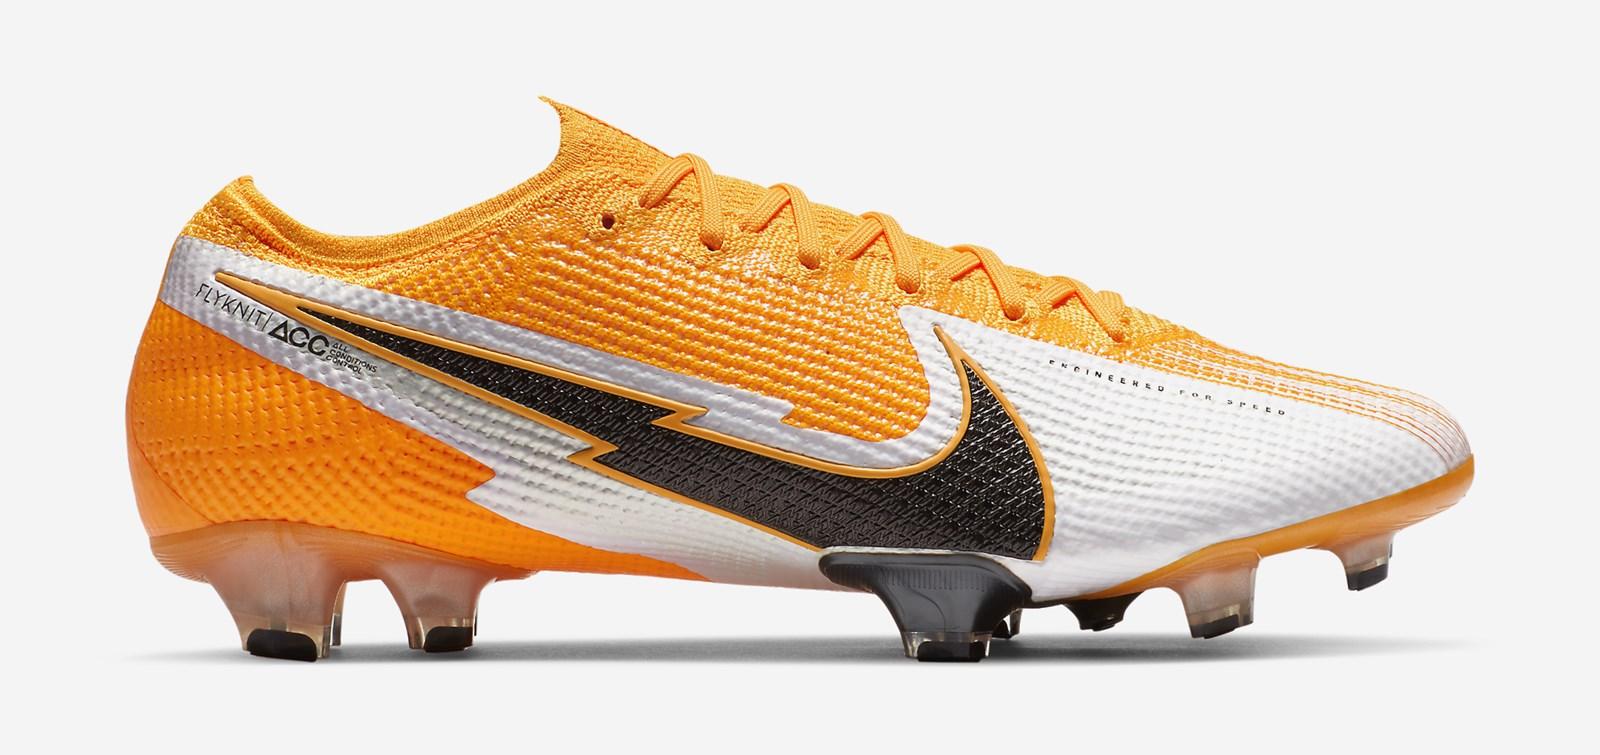 Elegante Cósmico puño  Philippe Coutinho Football Boots